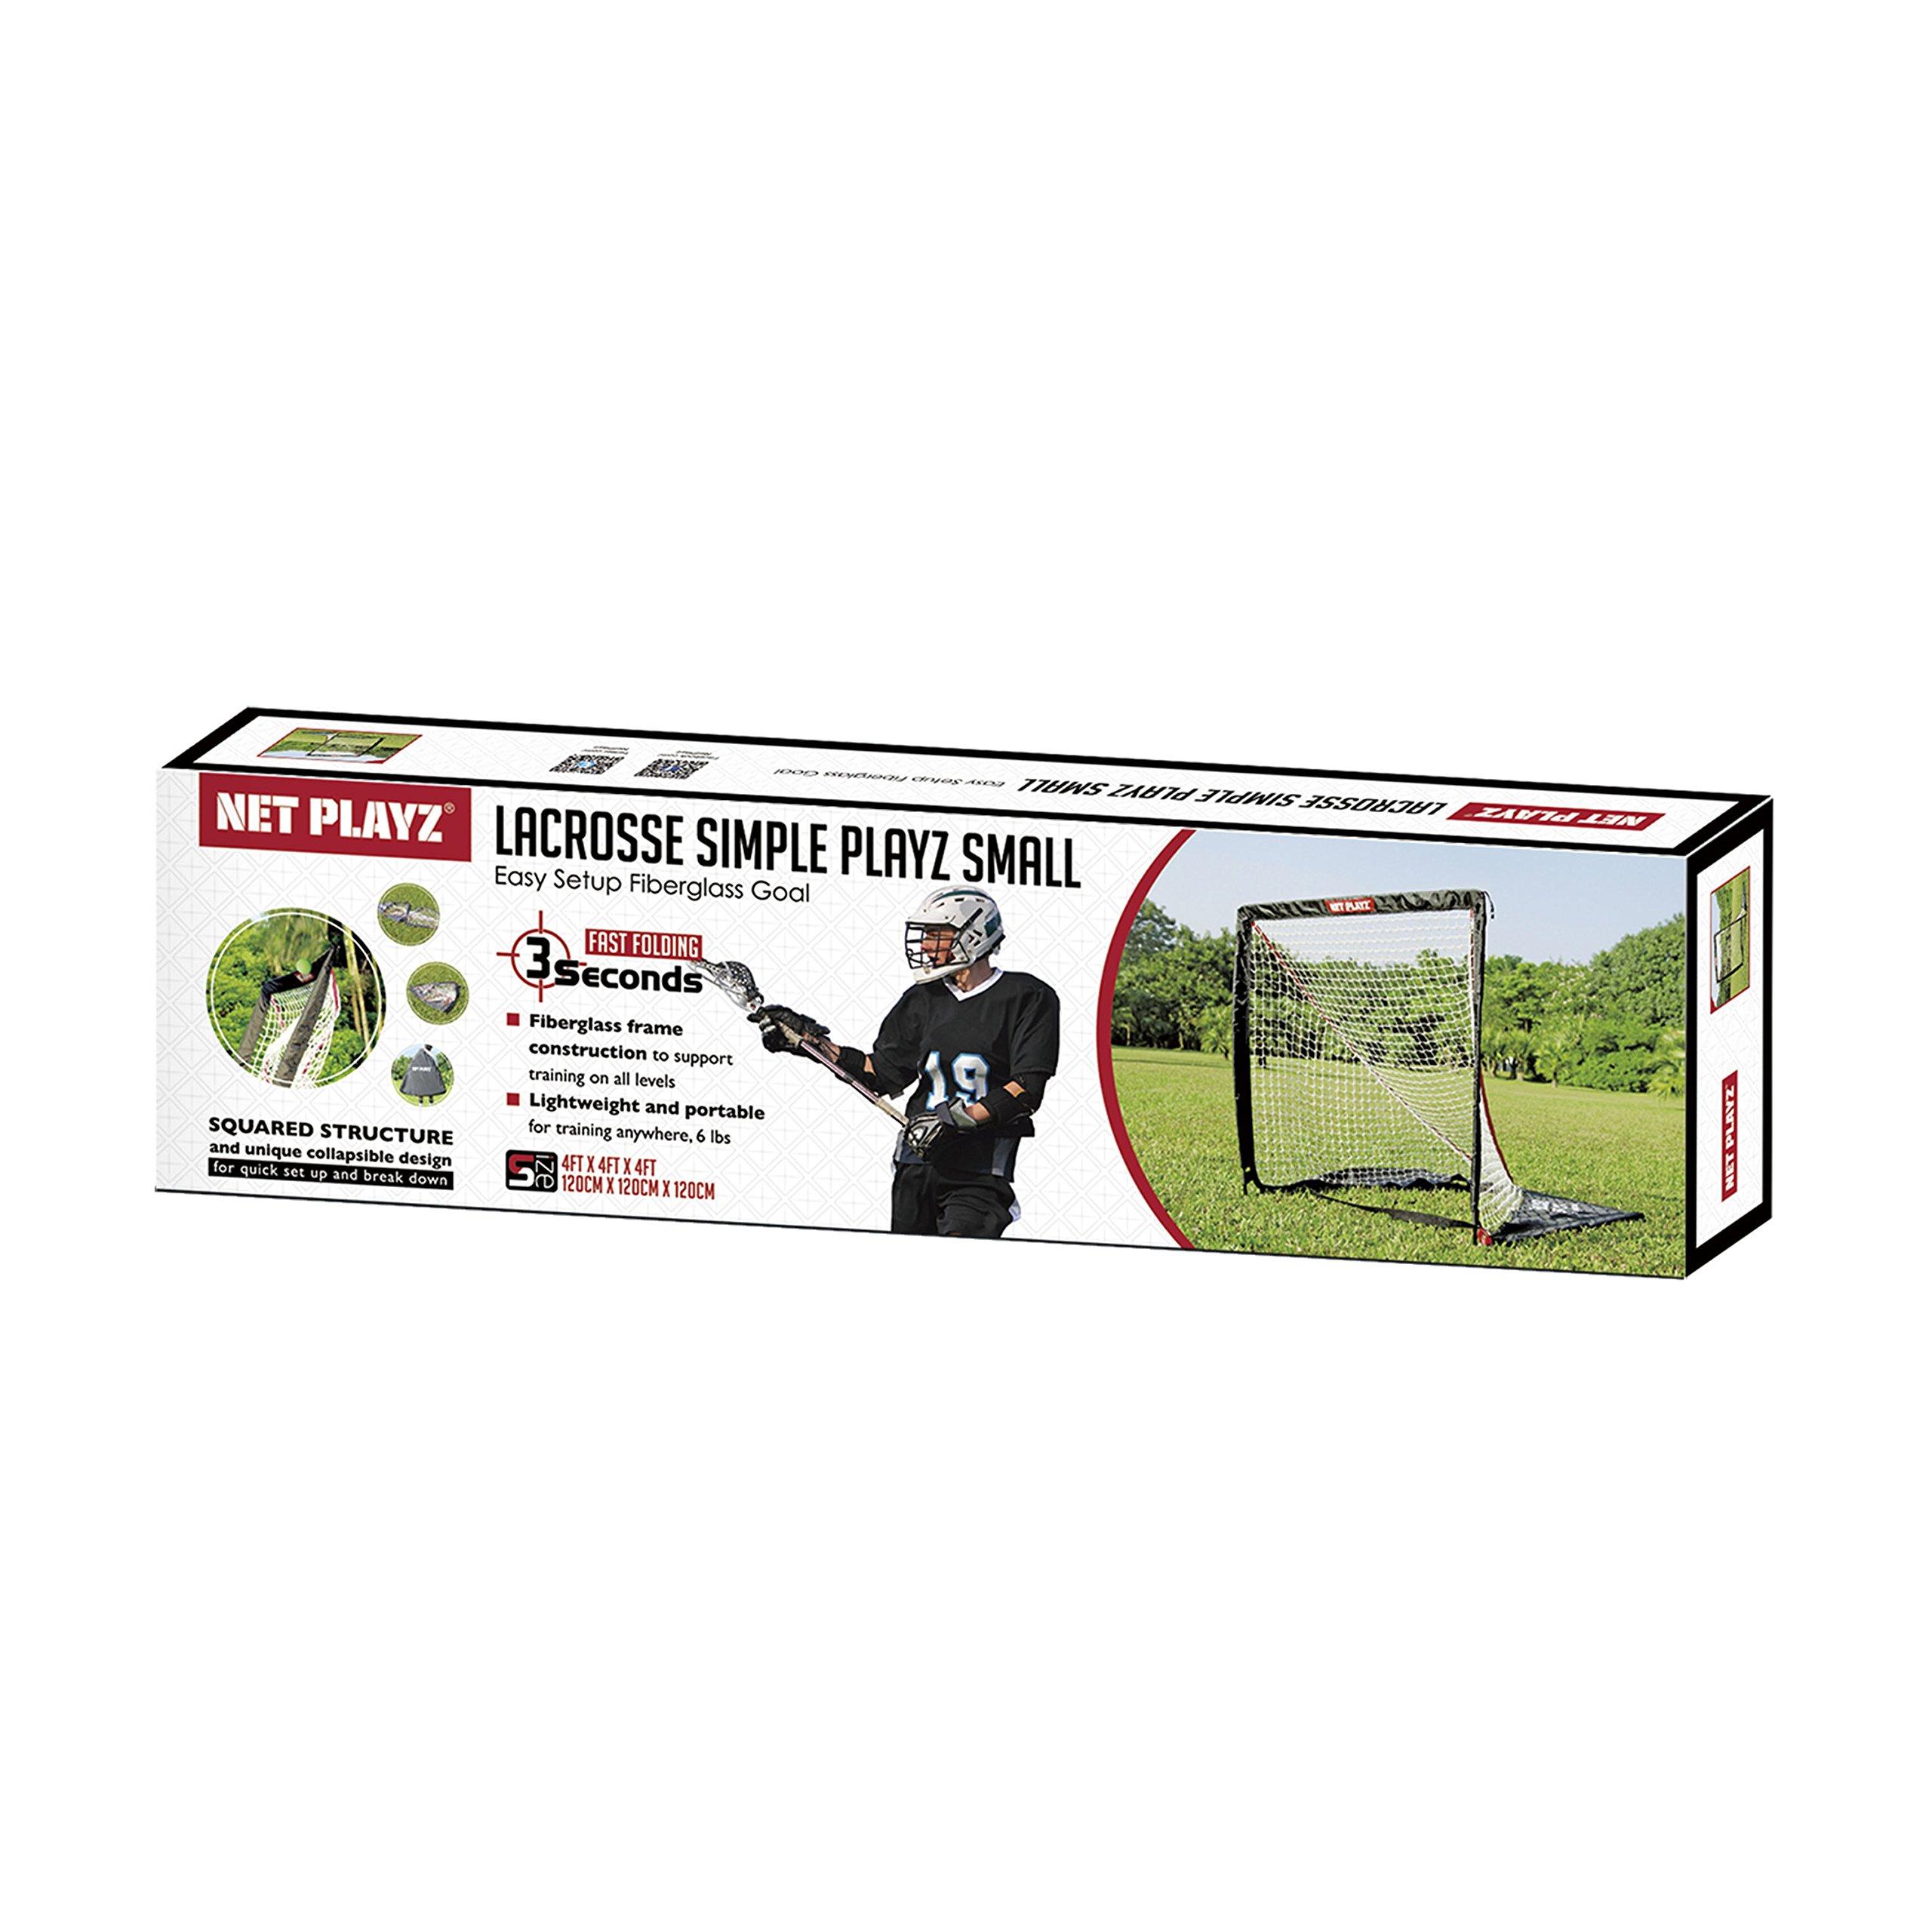 NET PLAYZ 4 x 4 x 4 Feet Lacrosse Goal Fast Install, Fiberglass Frme, Lightweight, Foldable, Portable, Carry bag Included by NET PLAYZ (Image #6)